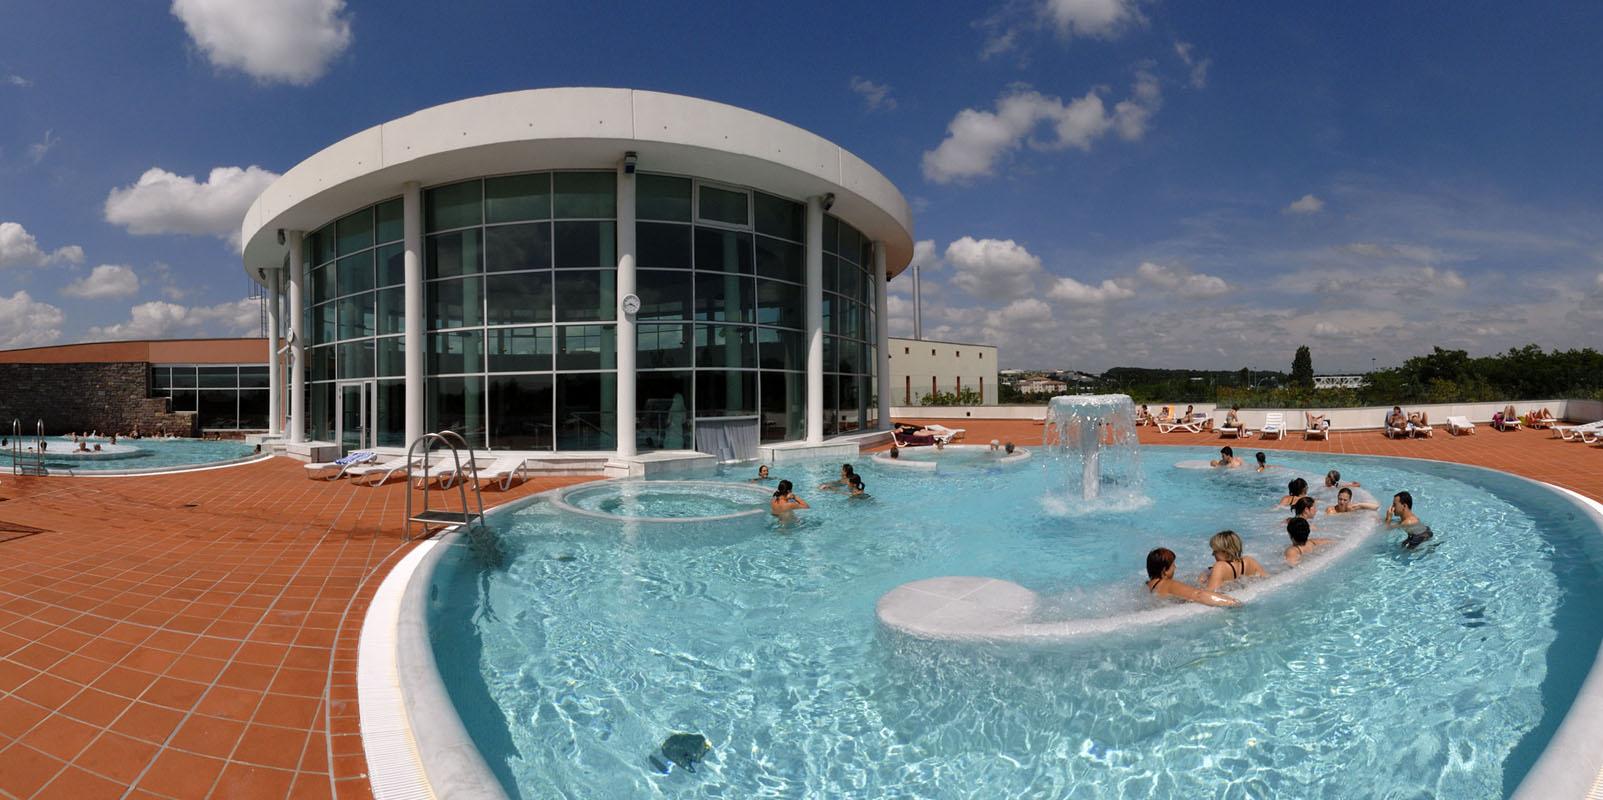 Caliceo | L'union | Balneotherapy, Fitness, , Spa à Piscine Balma